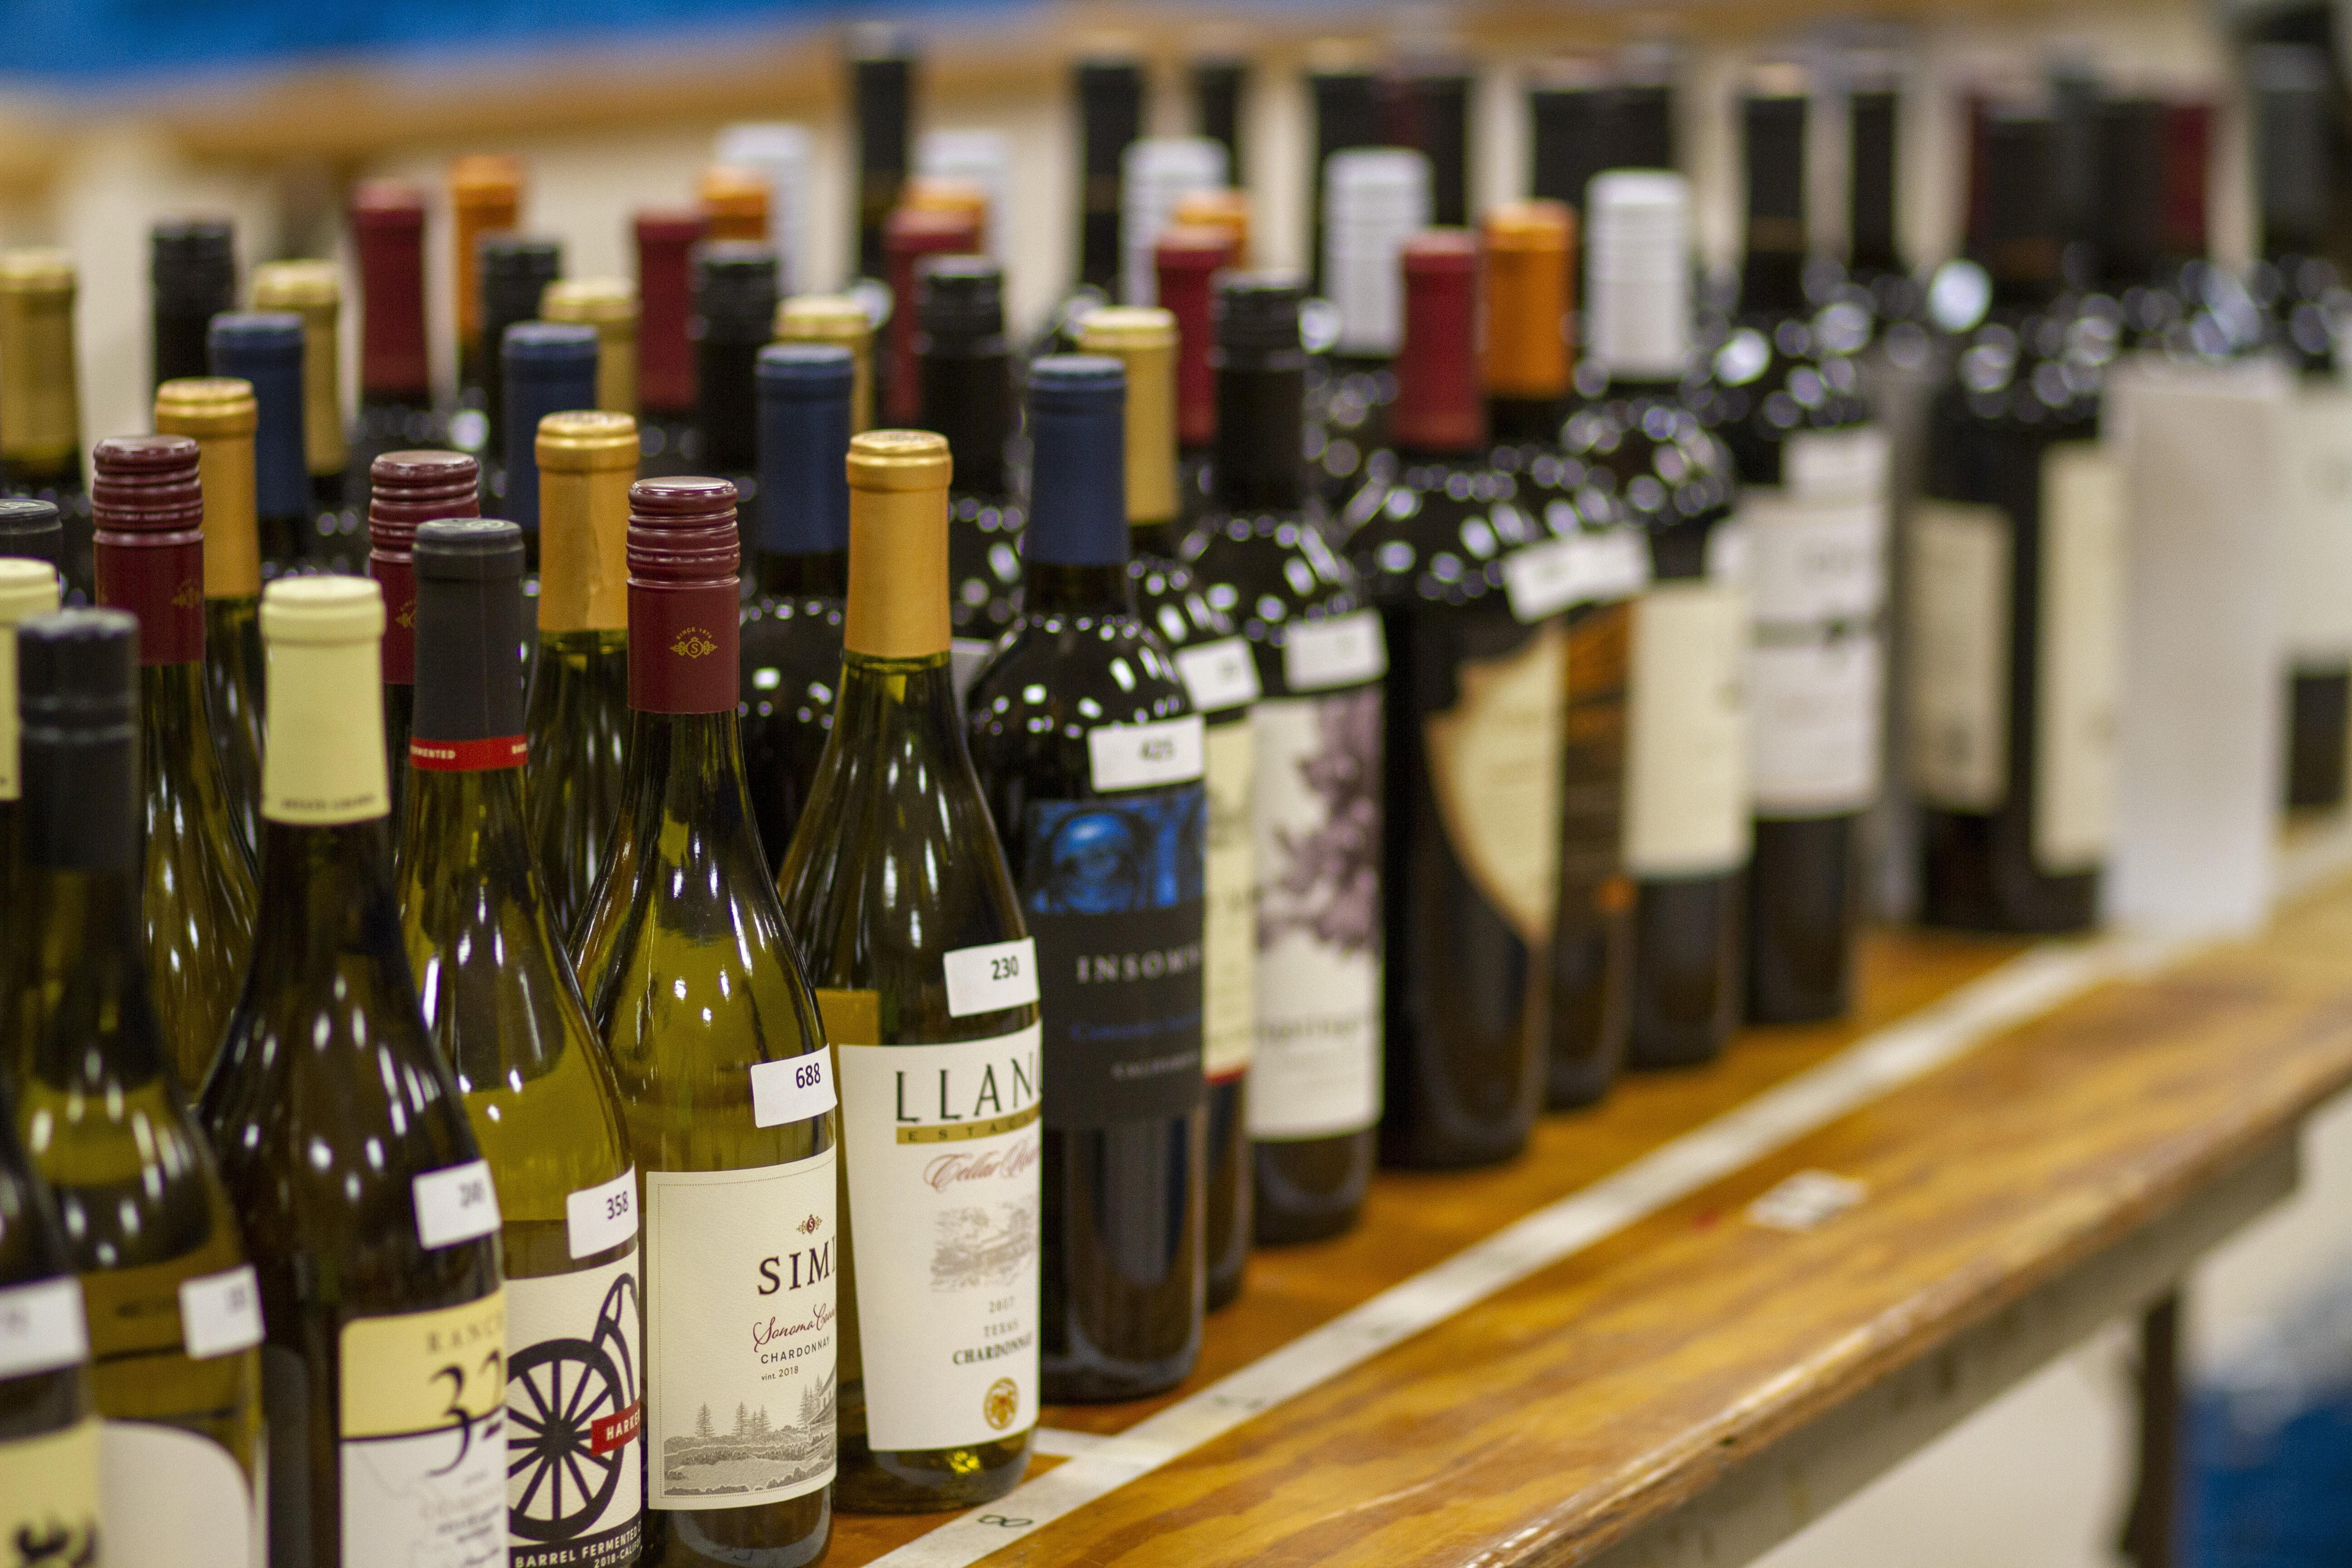 San Antonio Stock Show And Rodeo 2020.San Antonio Stock Show Rodeo Announces 2020 Champion Wines